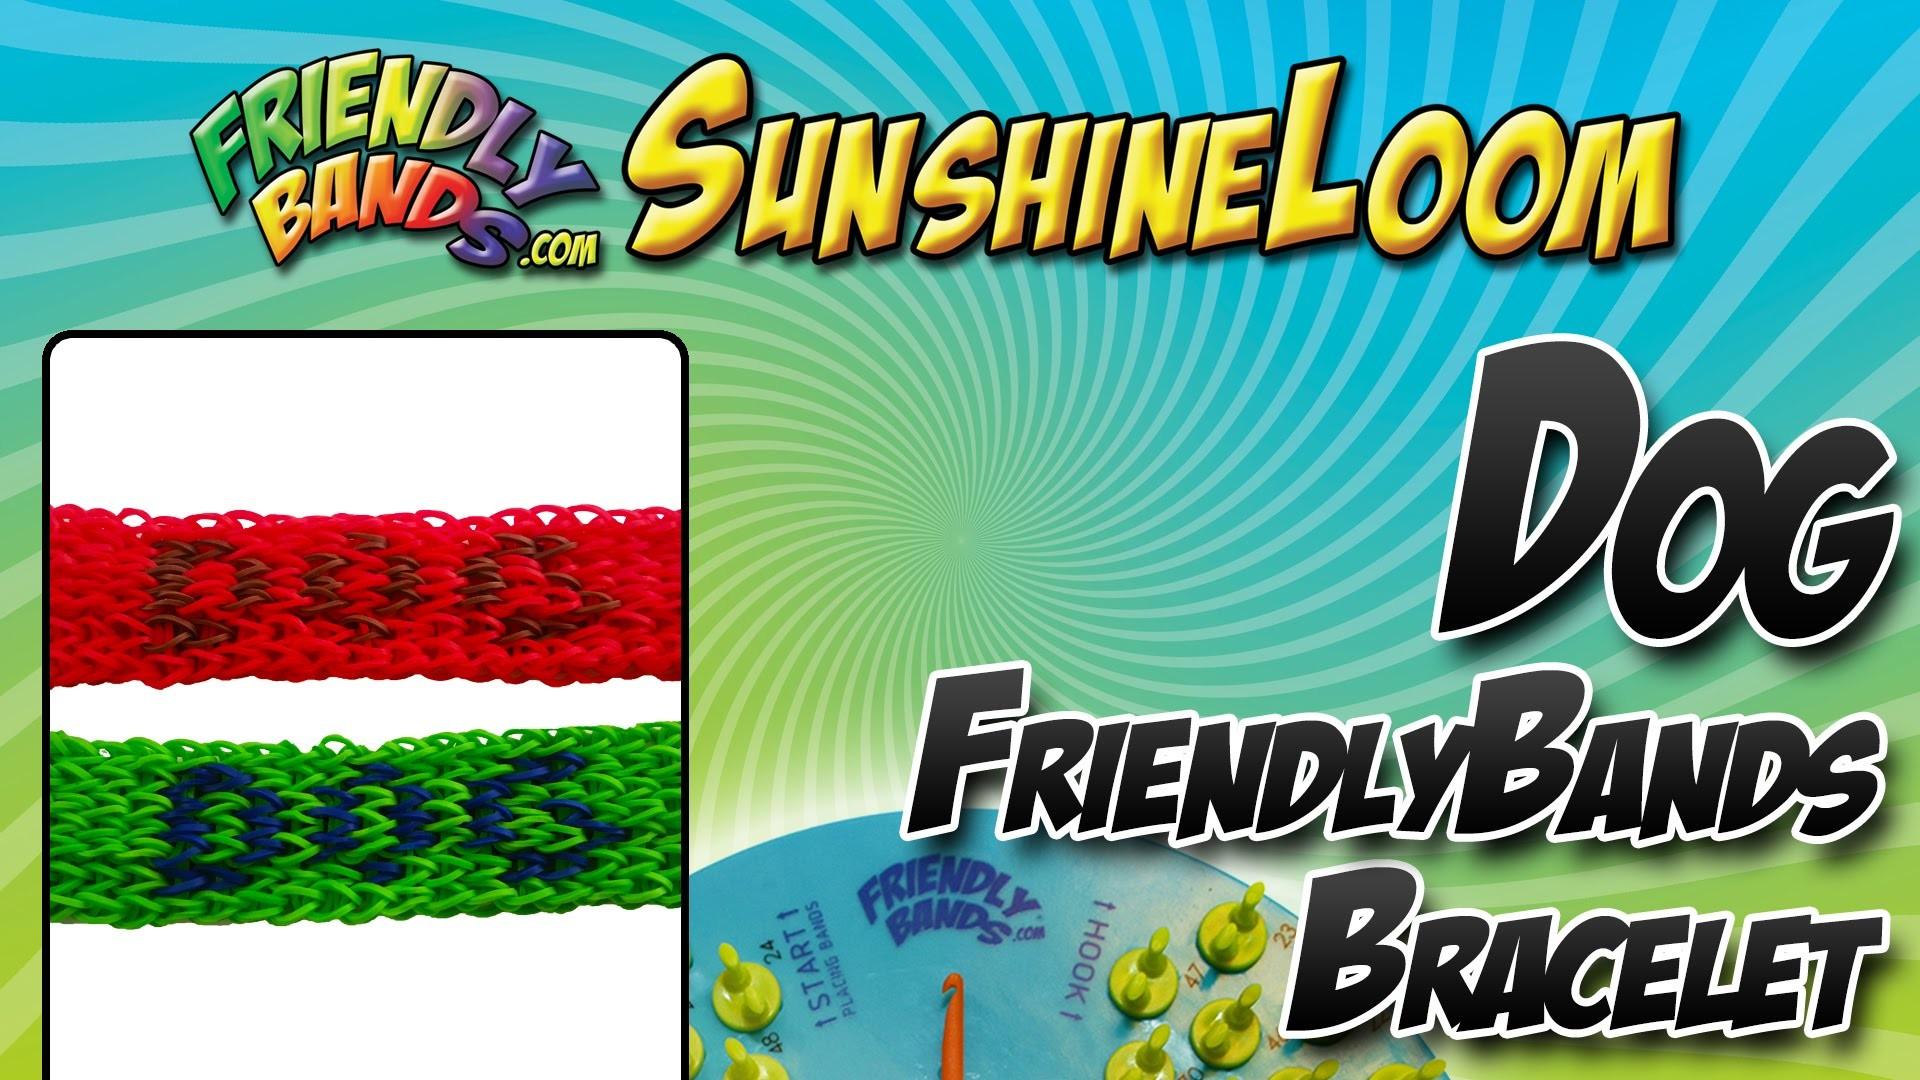 How to Make a FriendlyBand SunshineLoom - Dog HeptaBand Tutorial